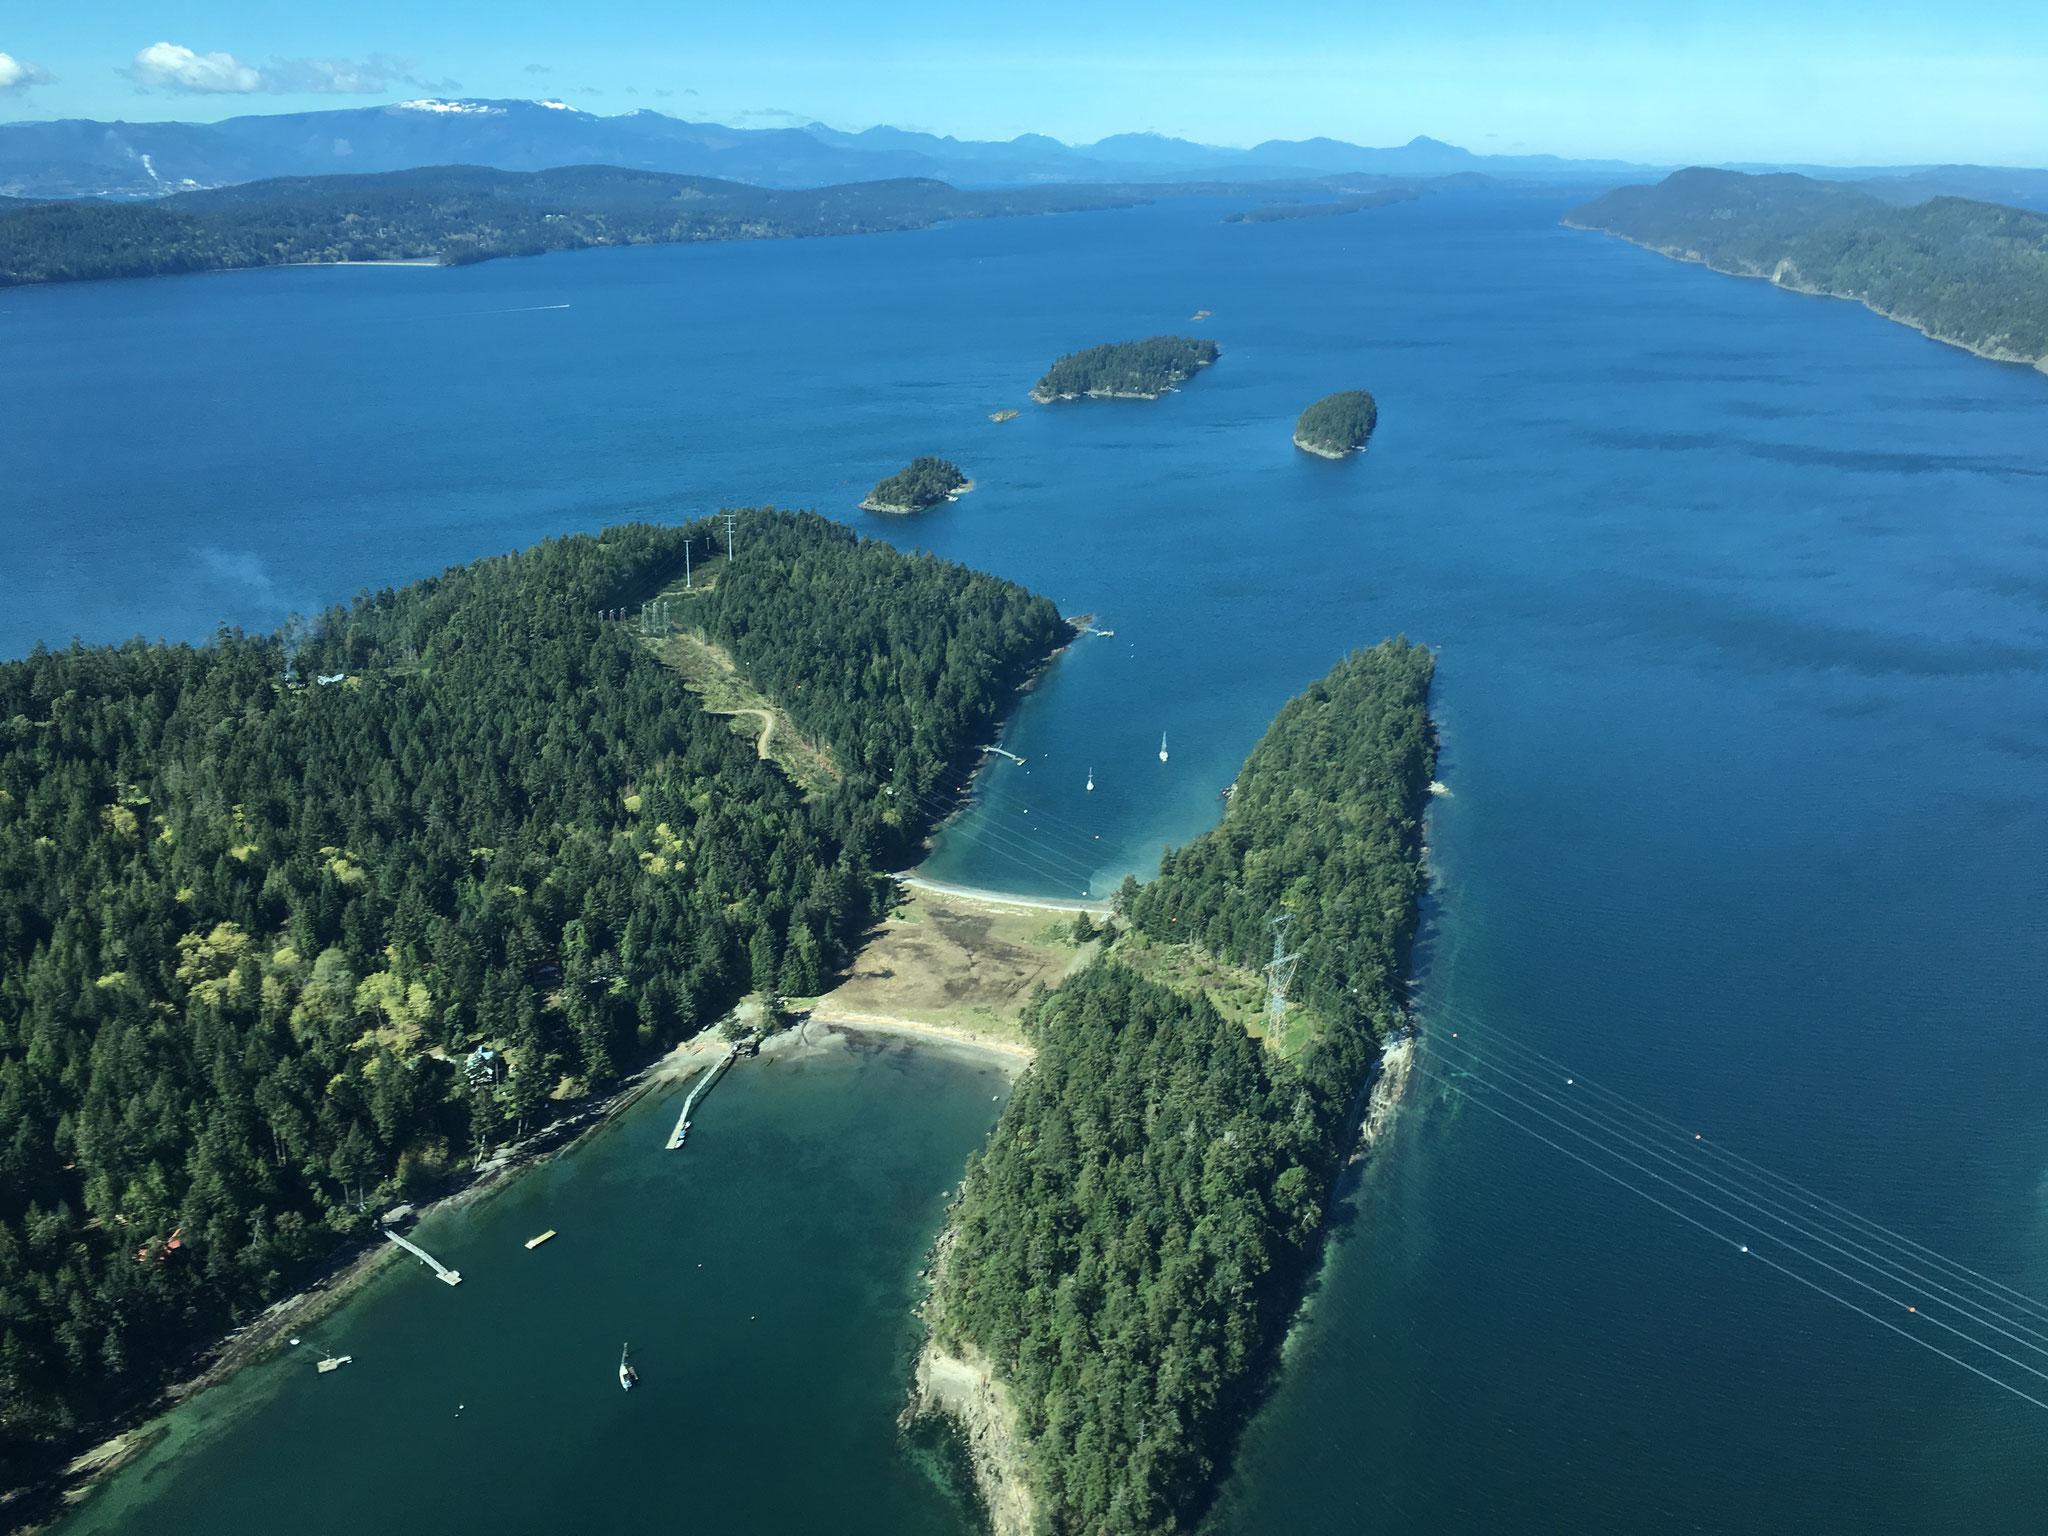 Flug von Saltspring Island nach Vancouver, BC, Canada 2016